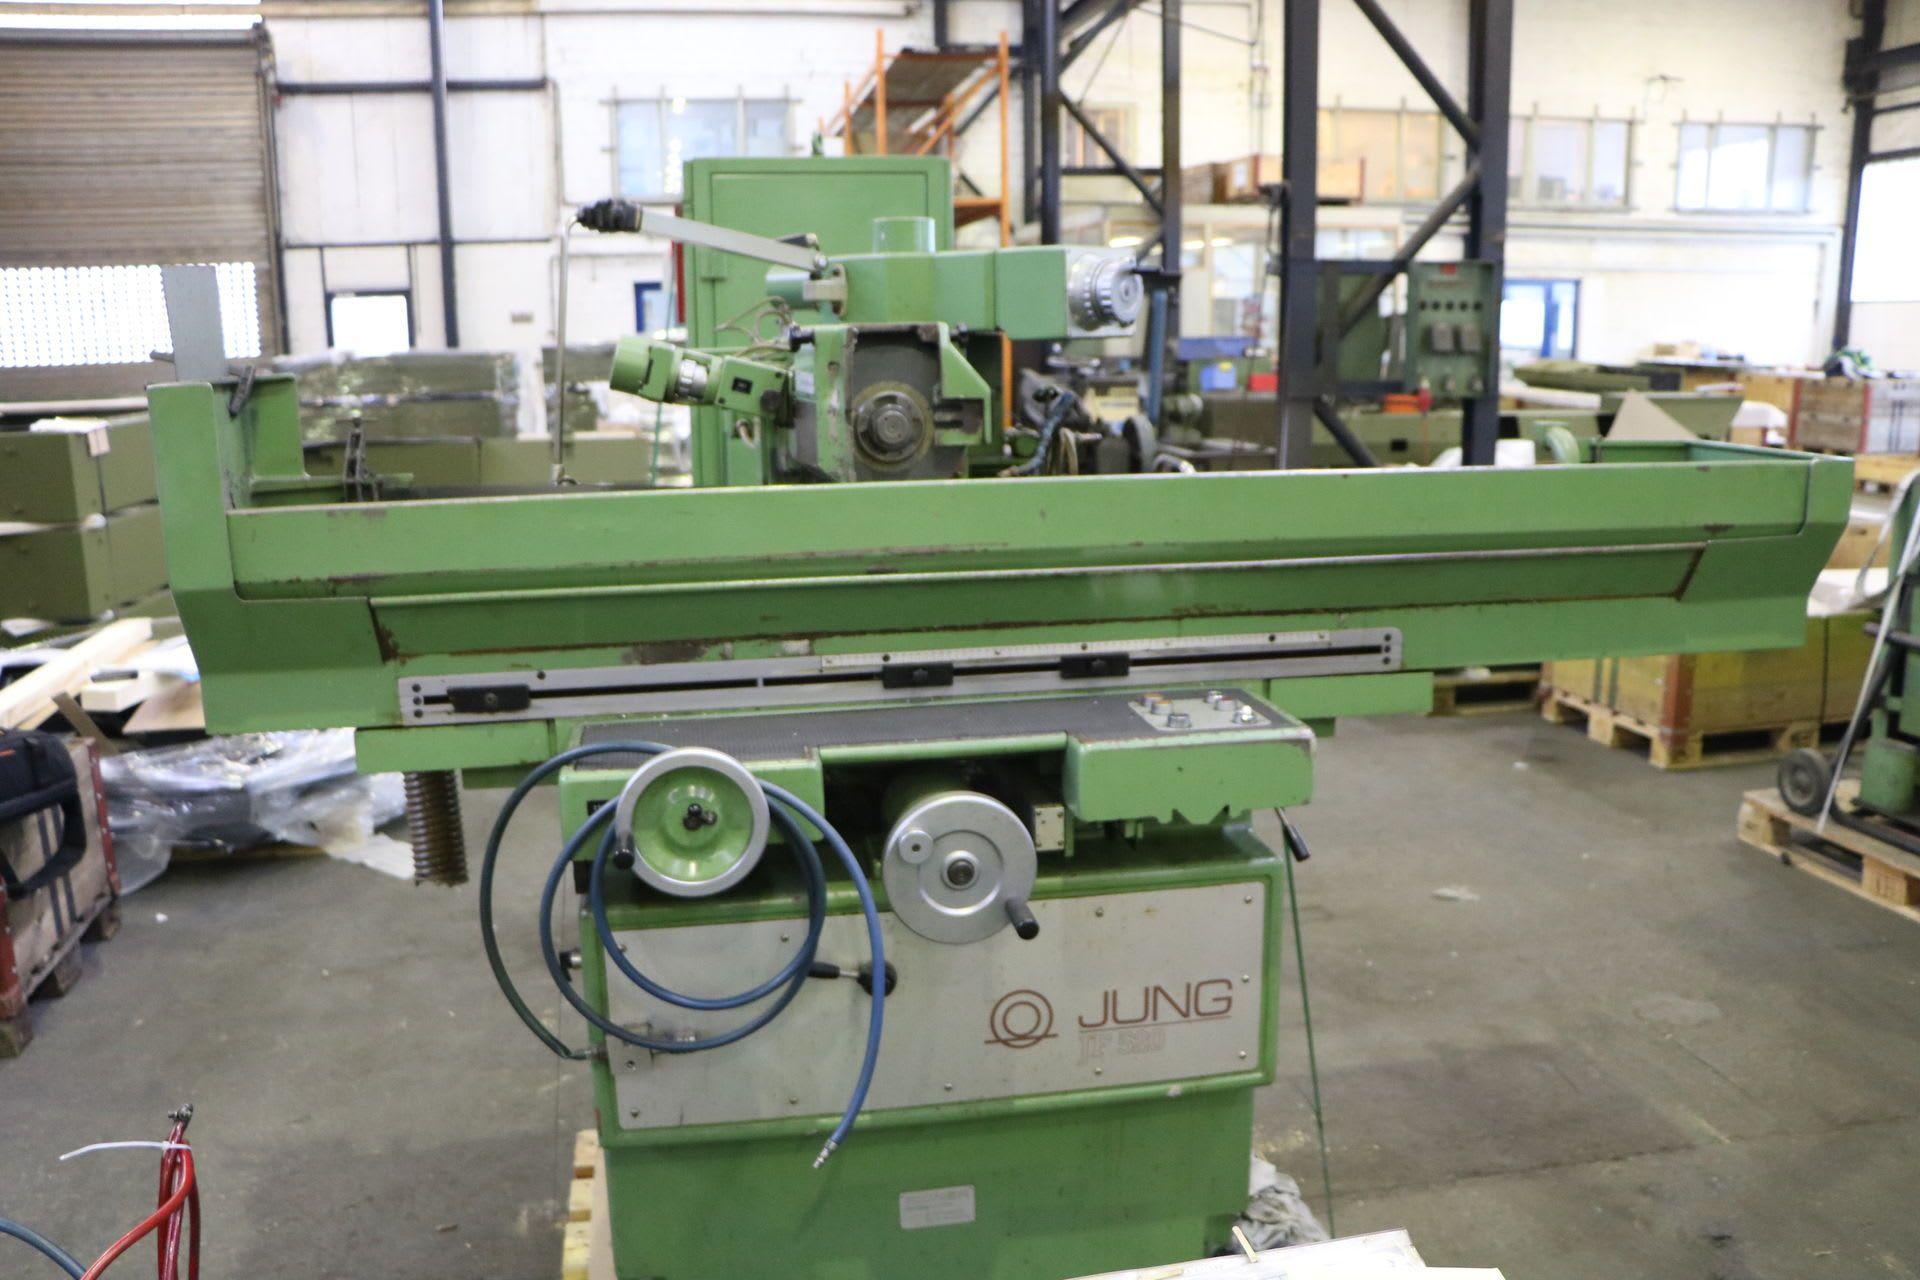 JUNG JF 520 M Flachschleifmaschine